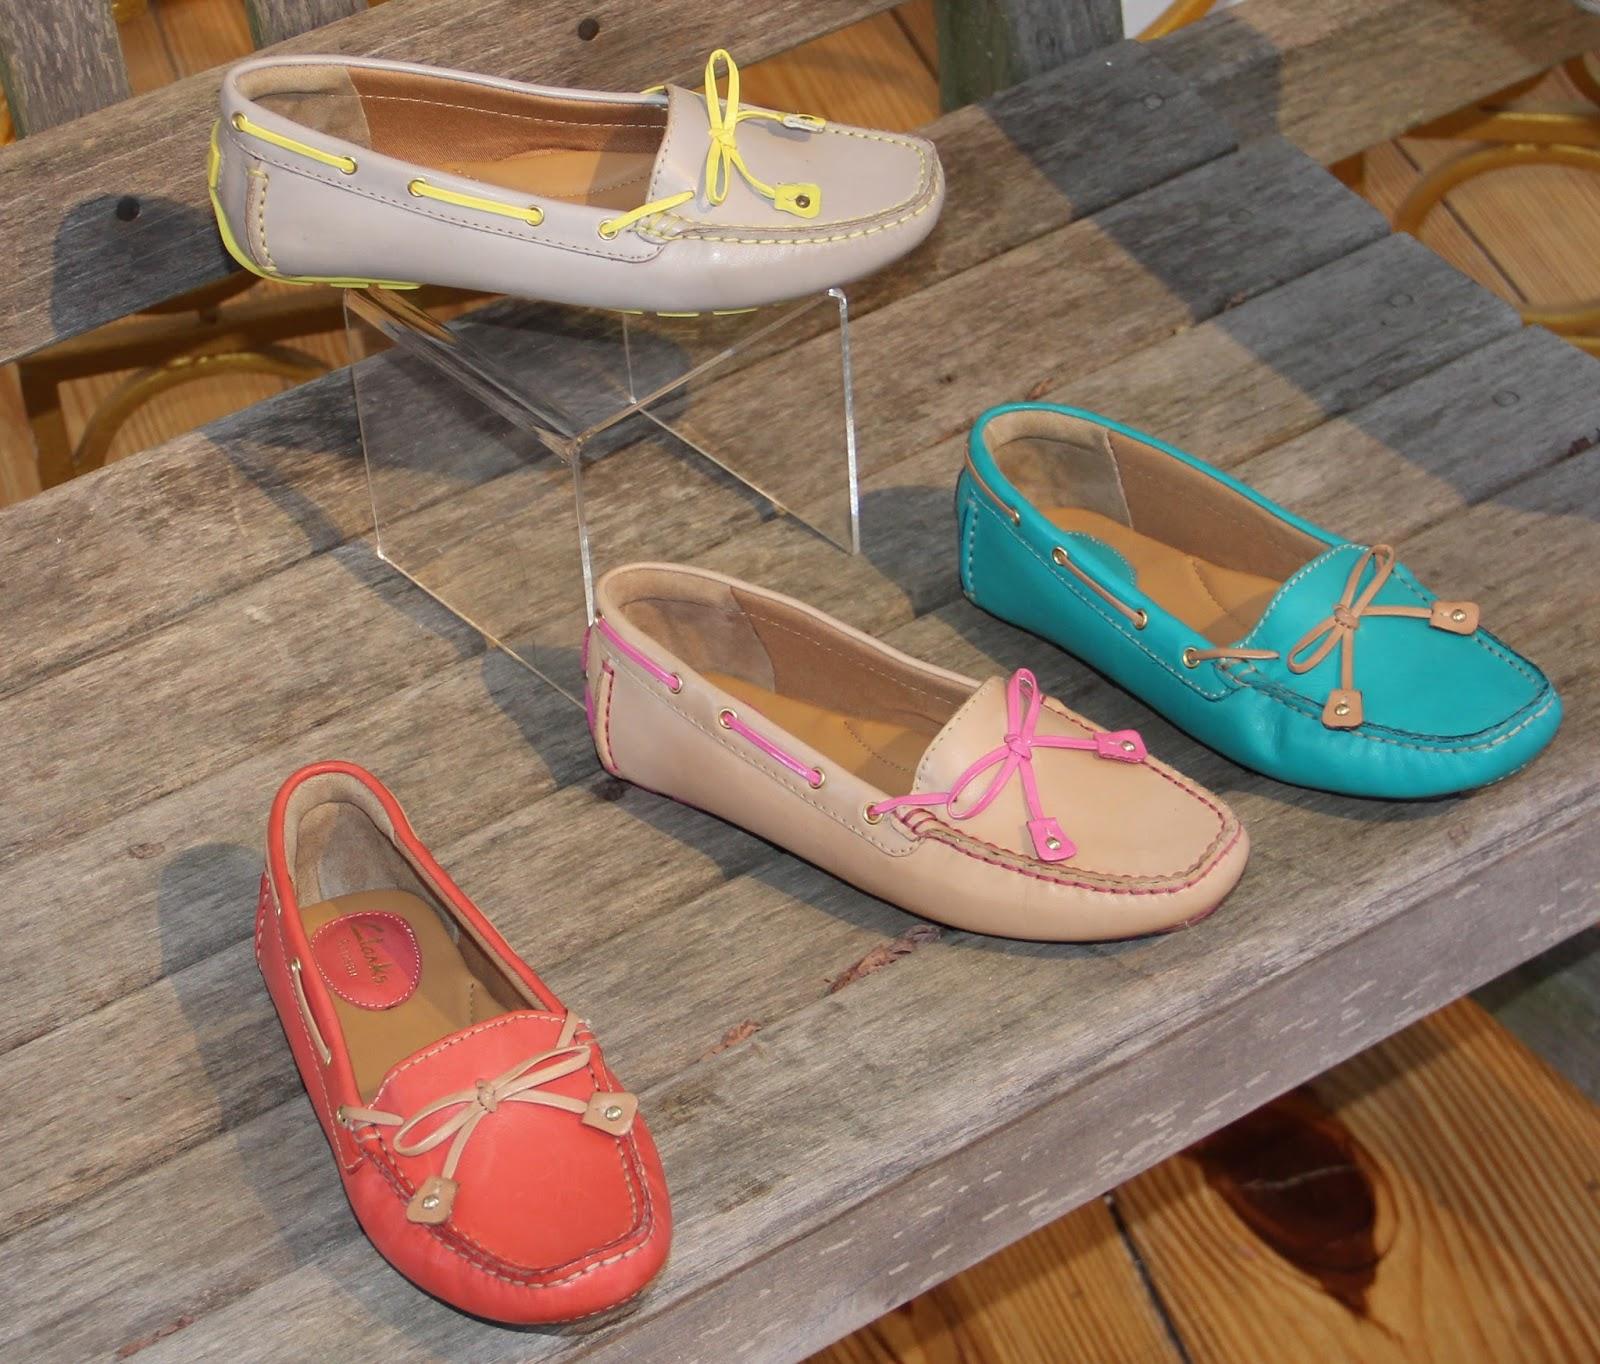 Narrow Womens Shoes Flat Driving Moccasins